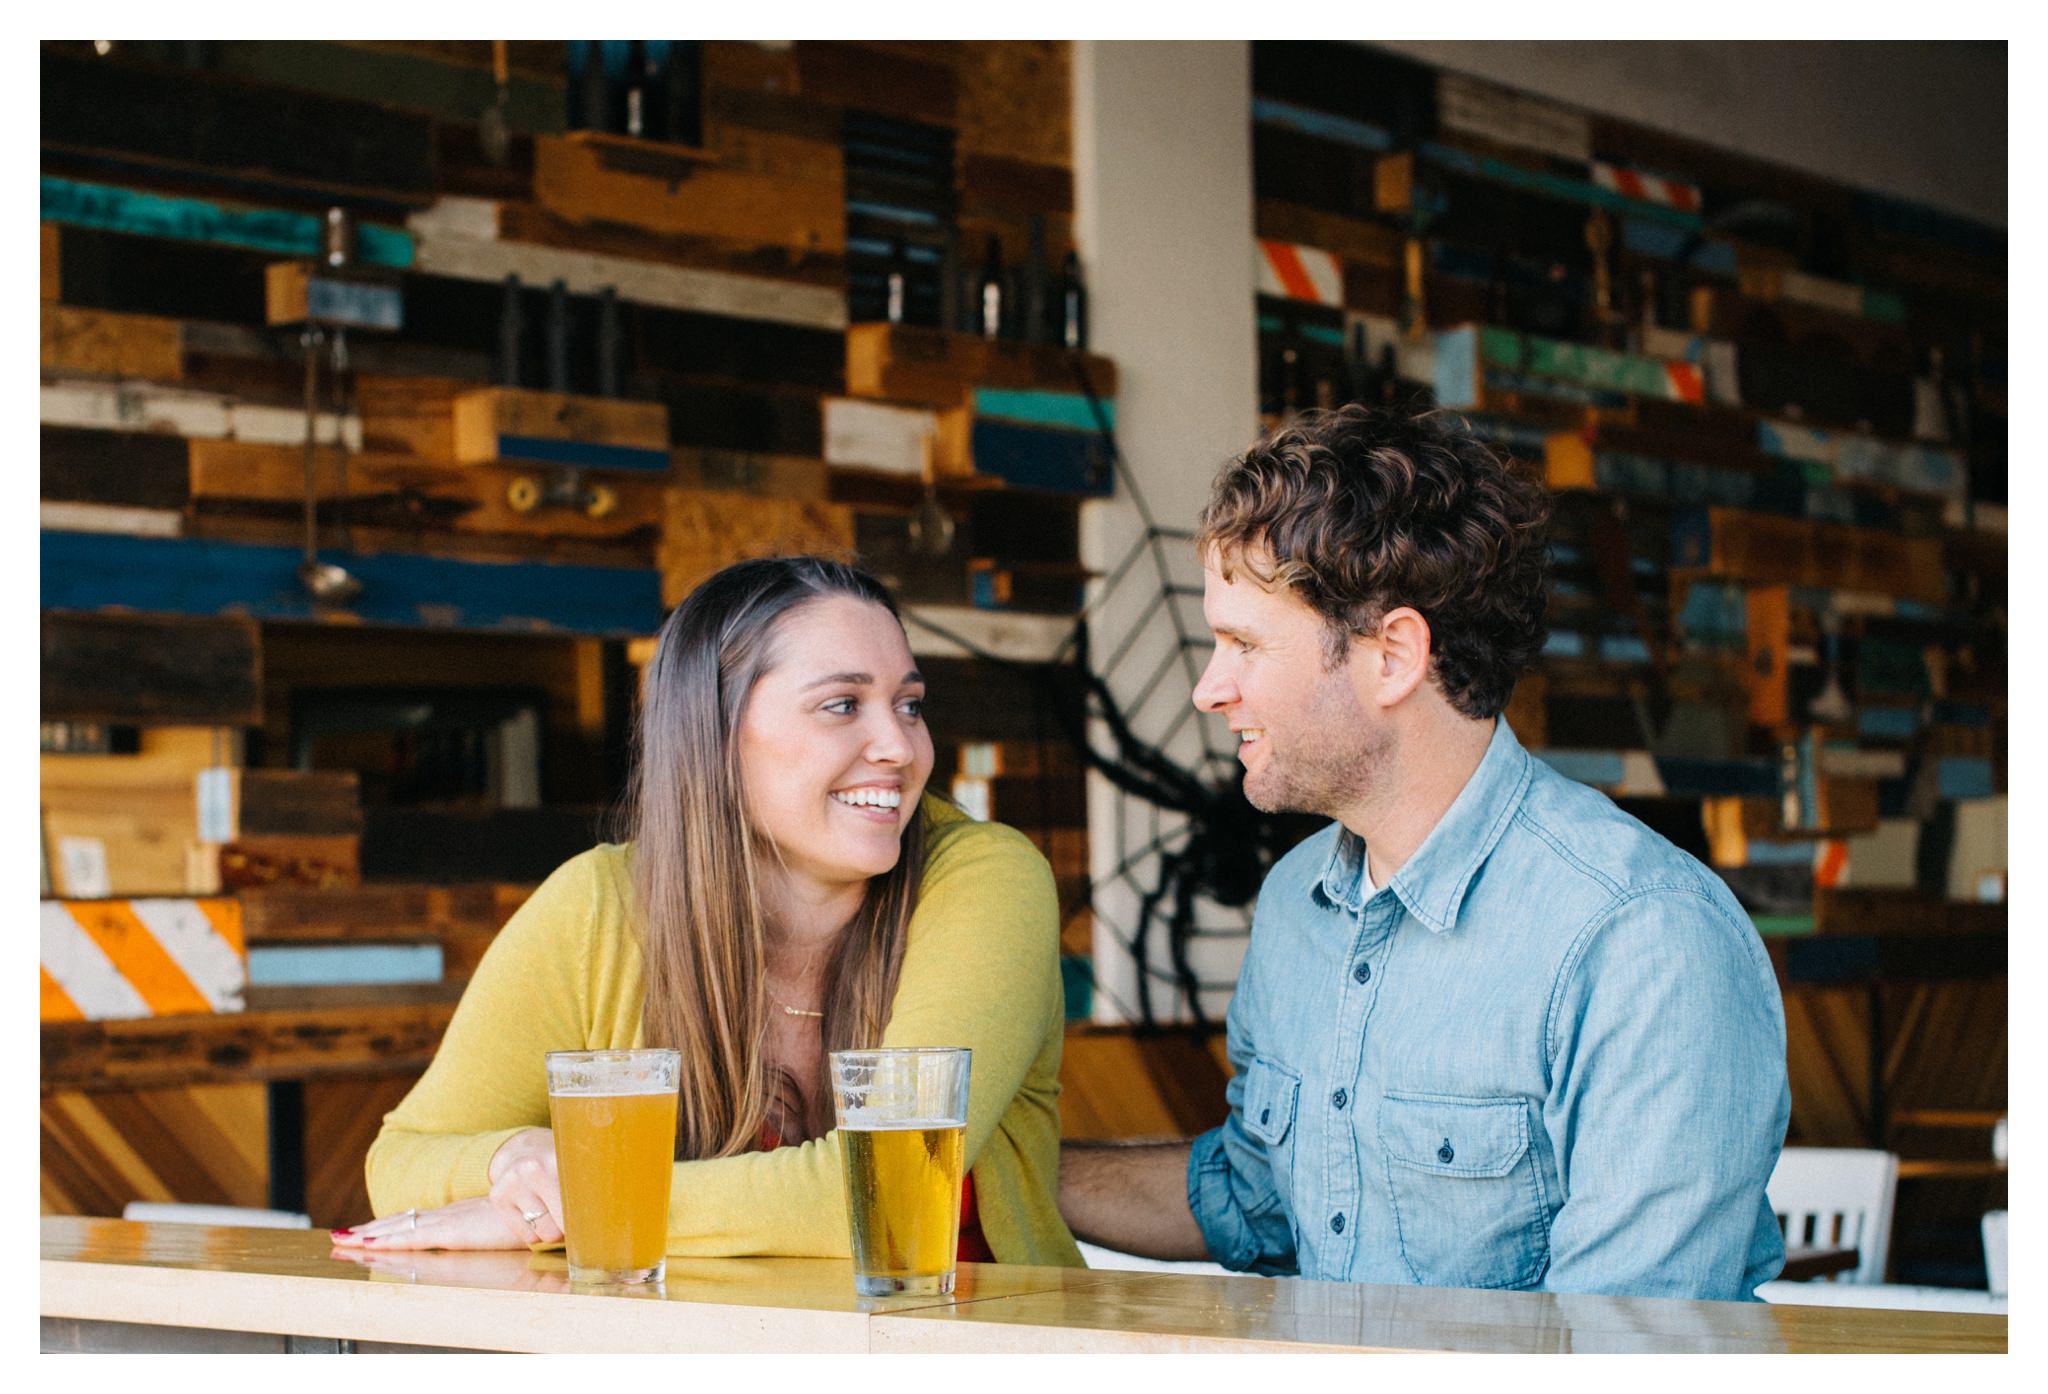 North_Park_San_Diego_Engagement_0016.jpg